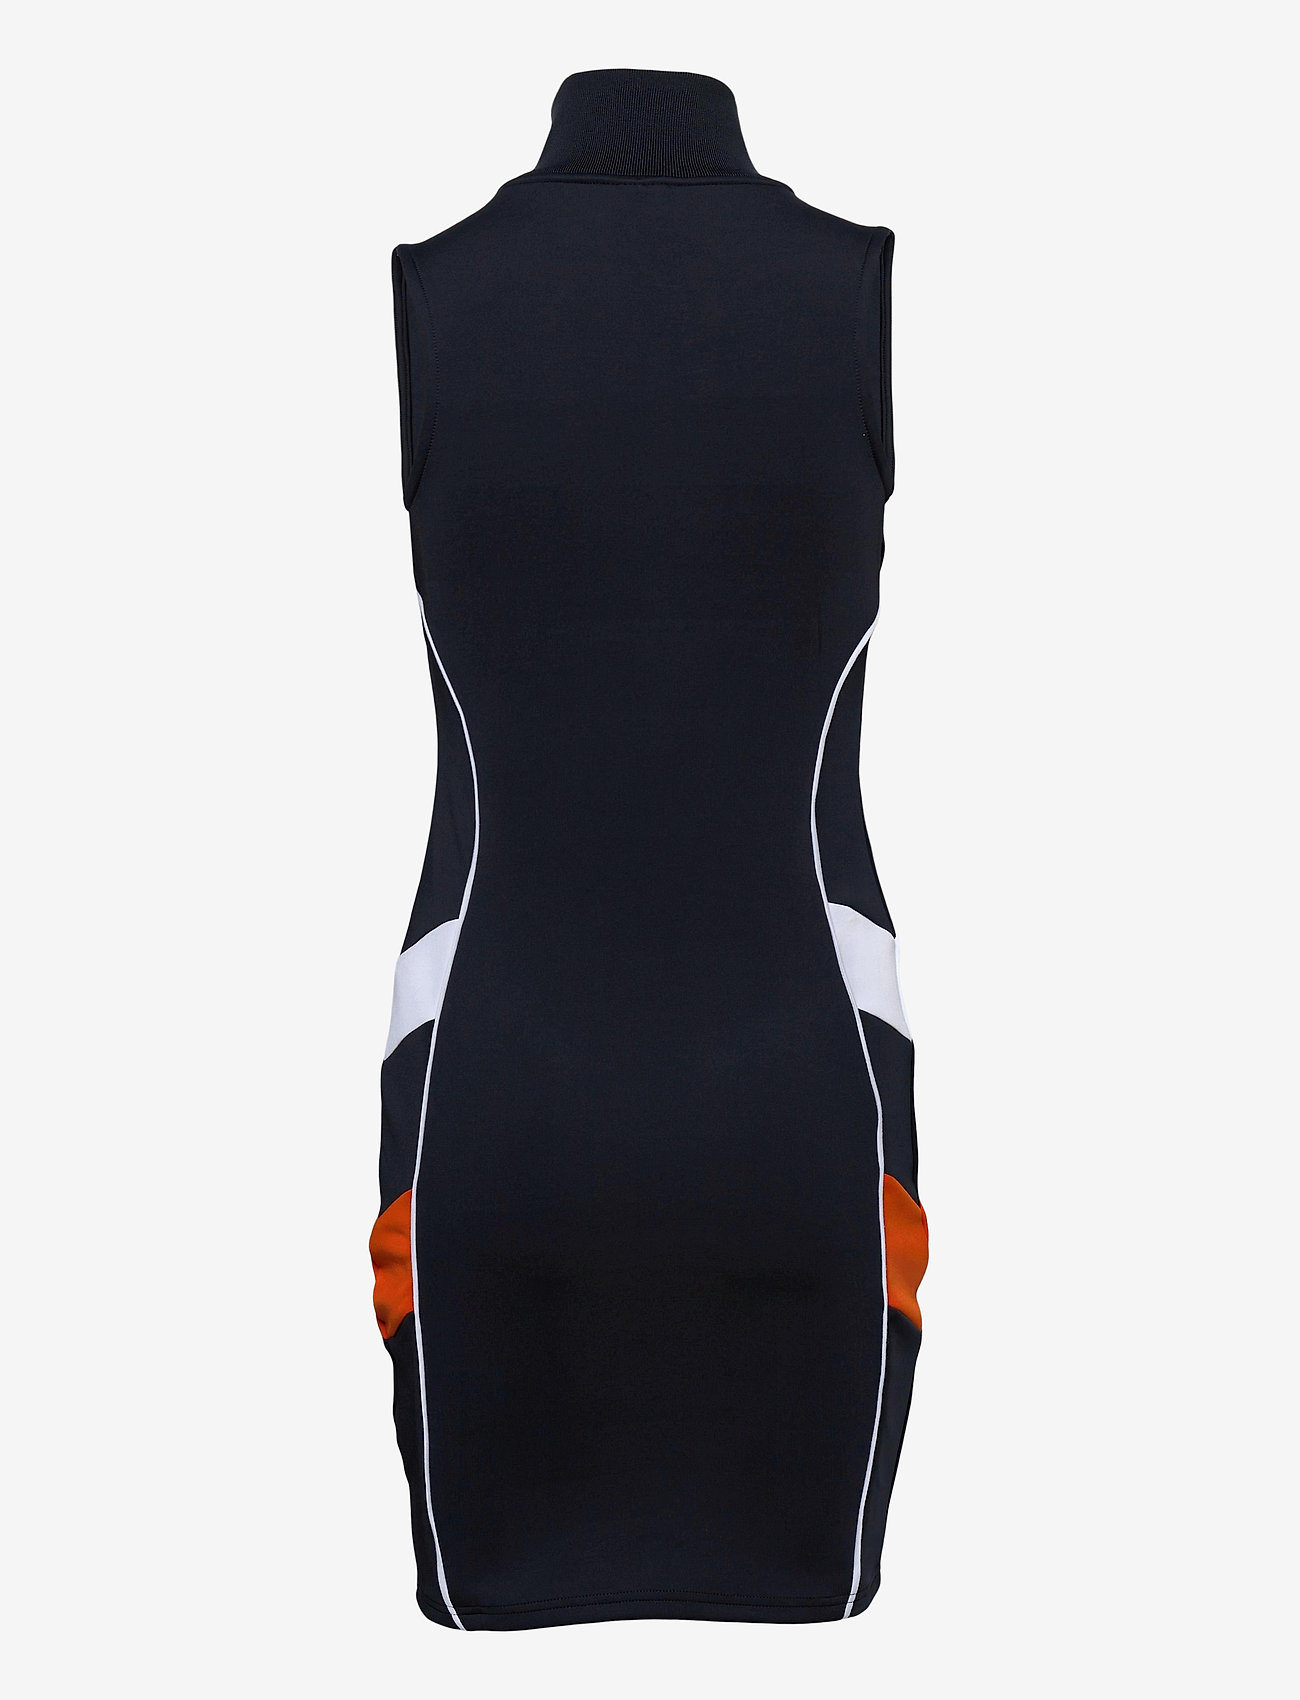 Ellesse - EL TRACK DRESS - bodycon dresses - navy - 1